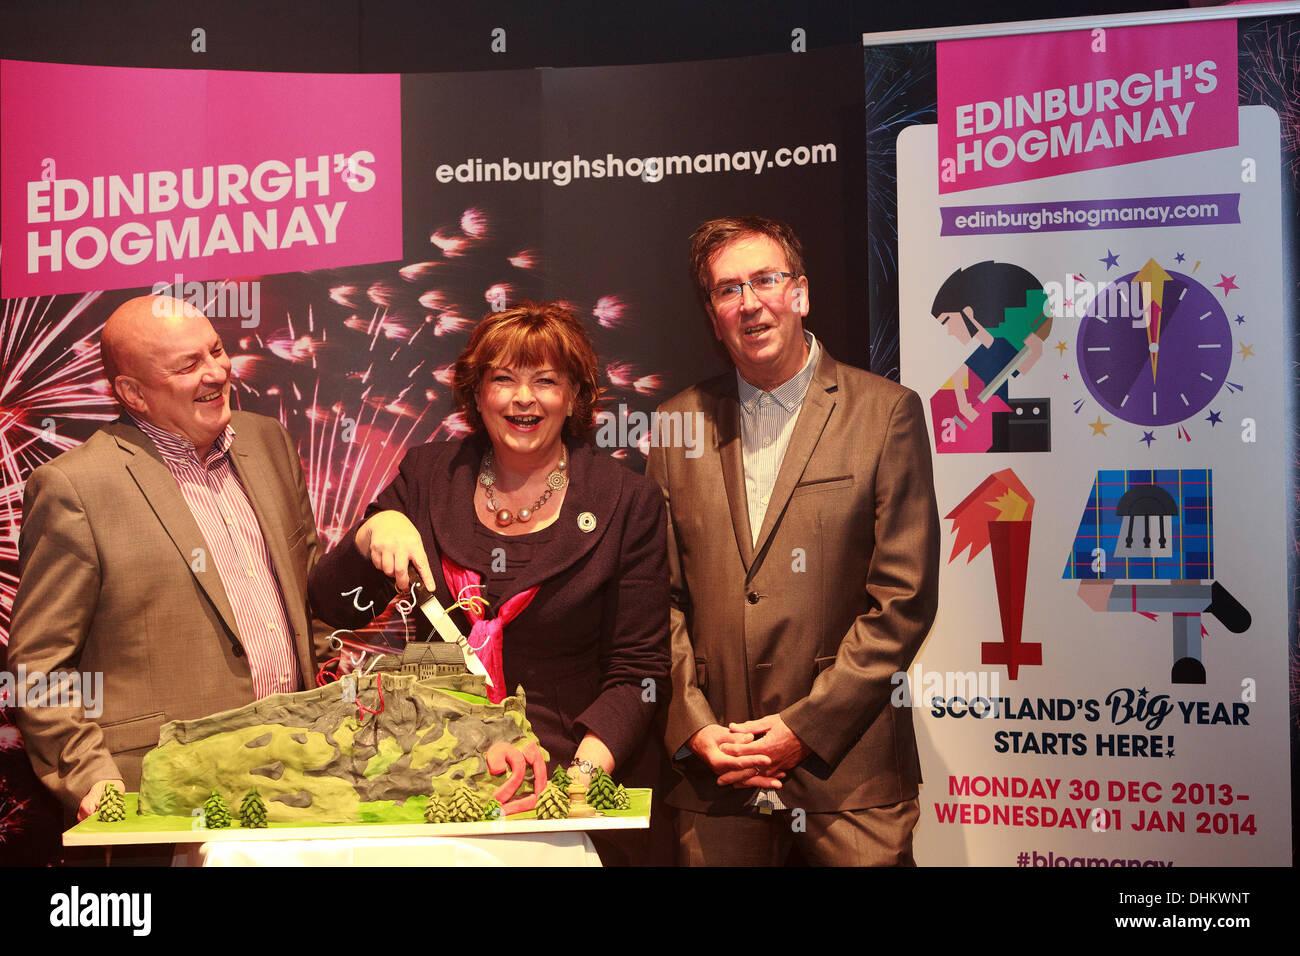 Edinburgh, UK. 12th Nov, 2013. Photocall Edinburgh's Hogmanay celebrates 21st birthday and launches the 2013/2014 Stock Photo